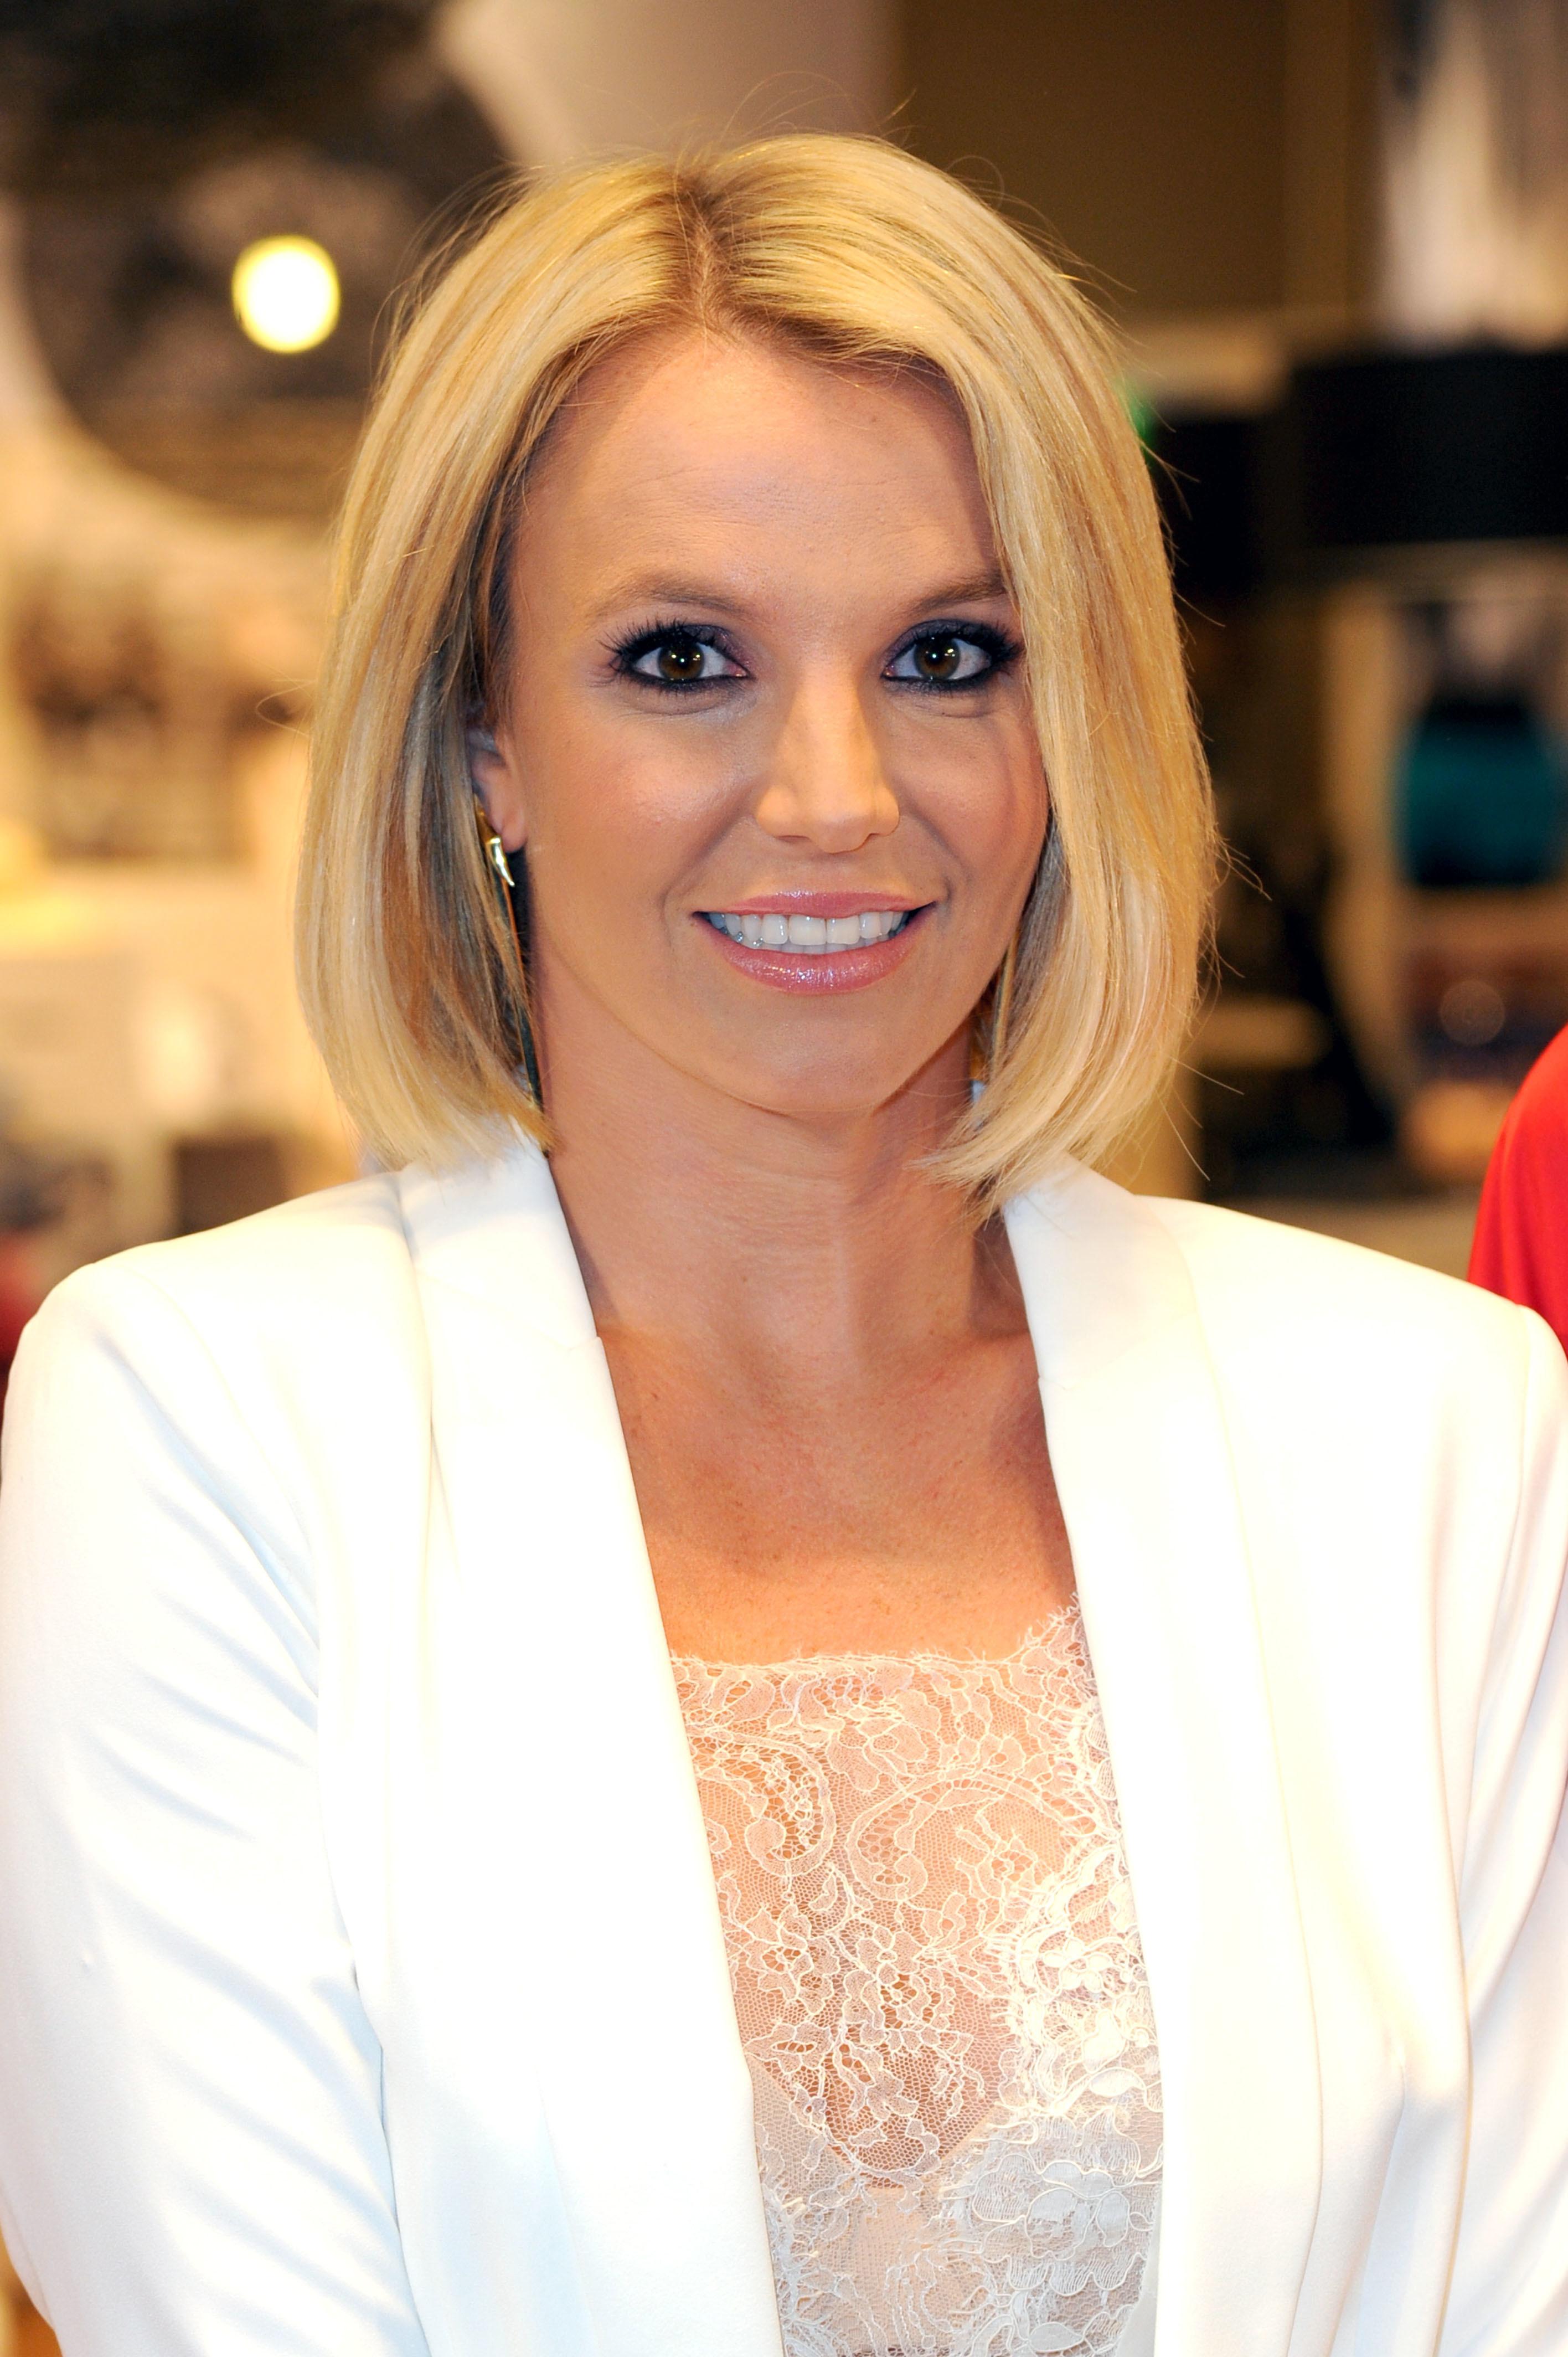 Britney Spears reveals sleek new bob